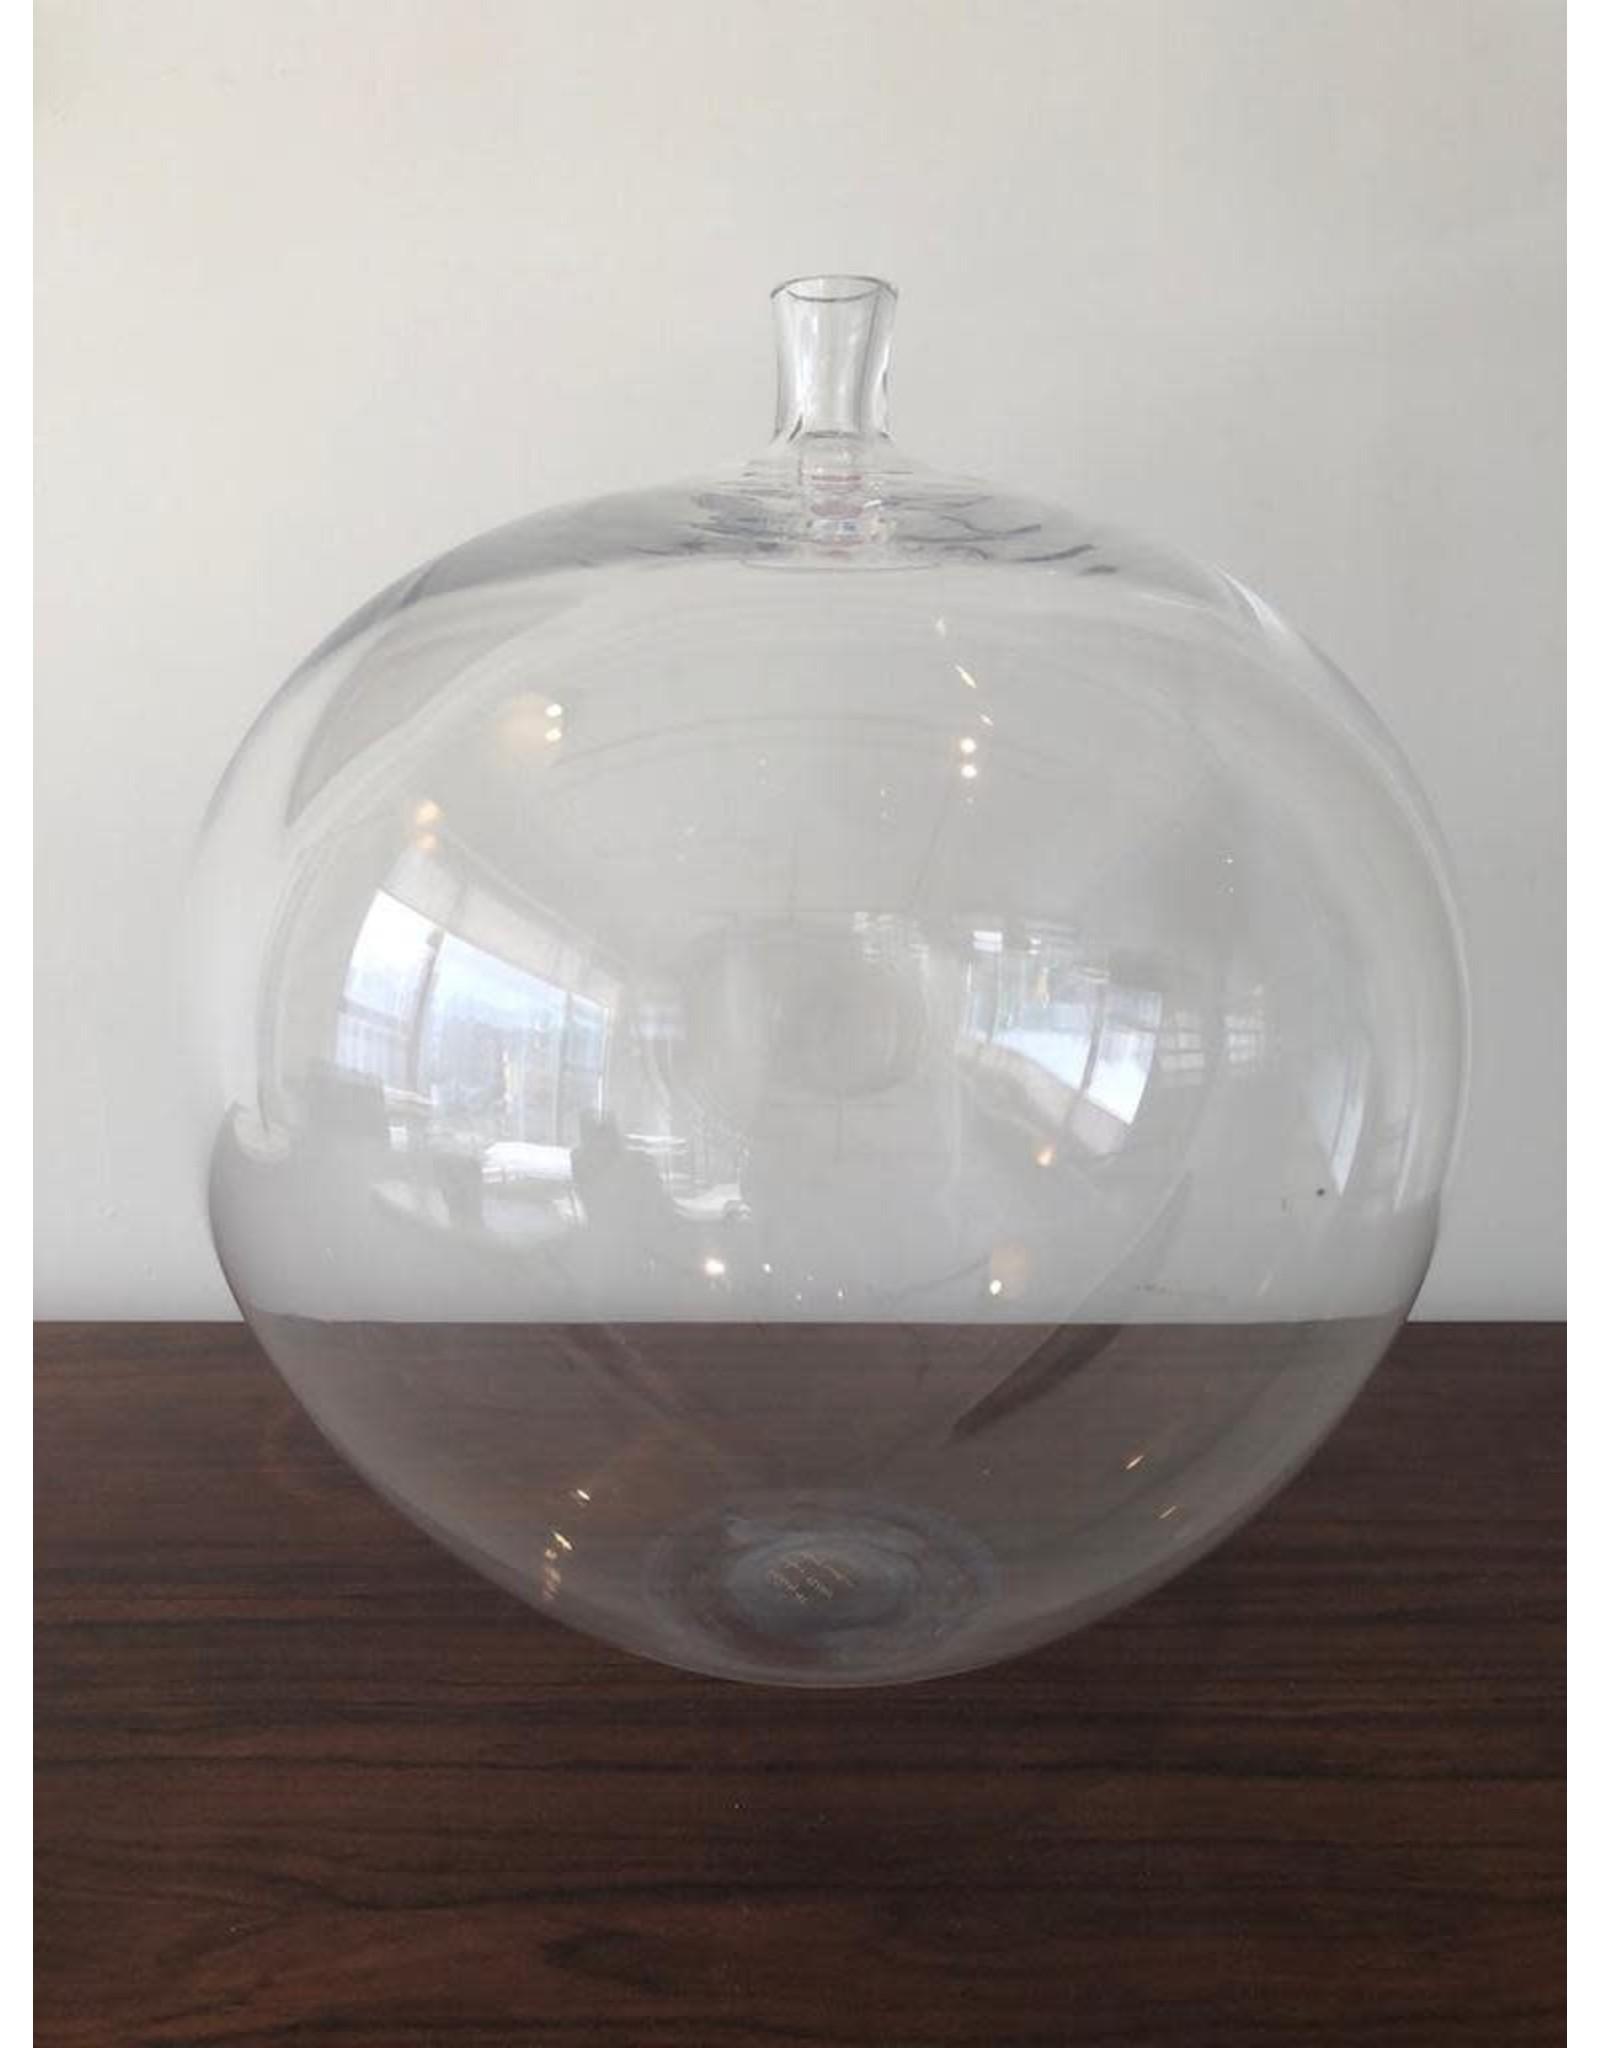 MANKS ANTIQUES RARE 稀有蘋果形玻璃古董花瓶